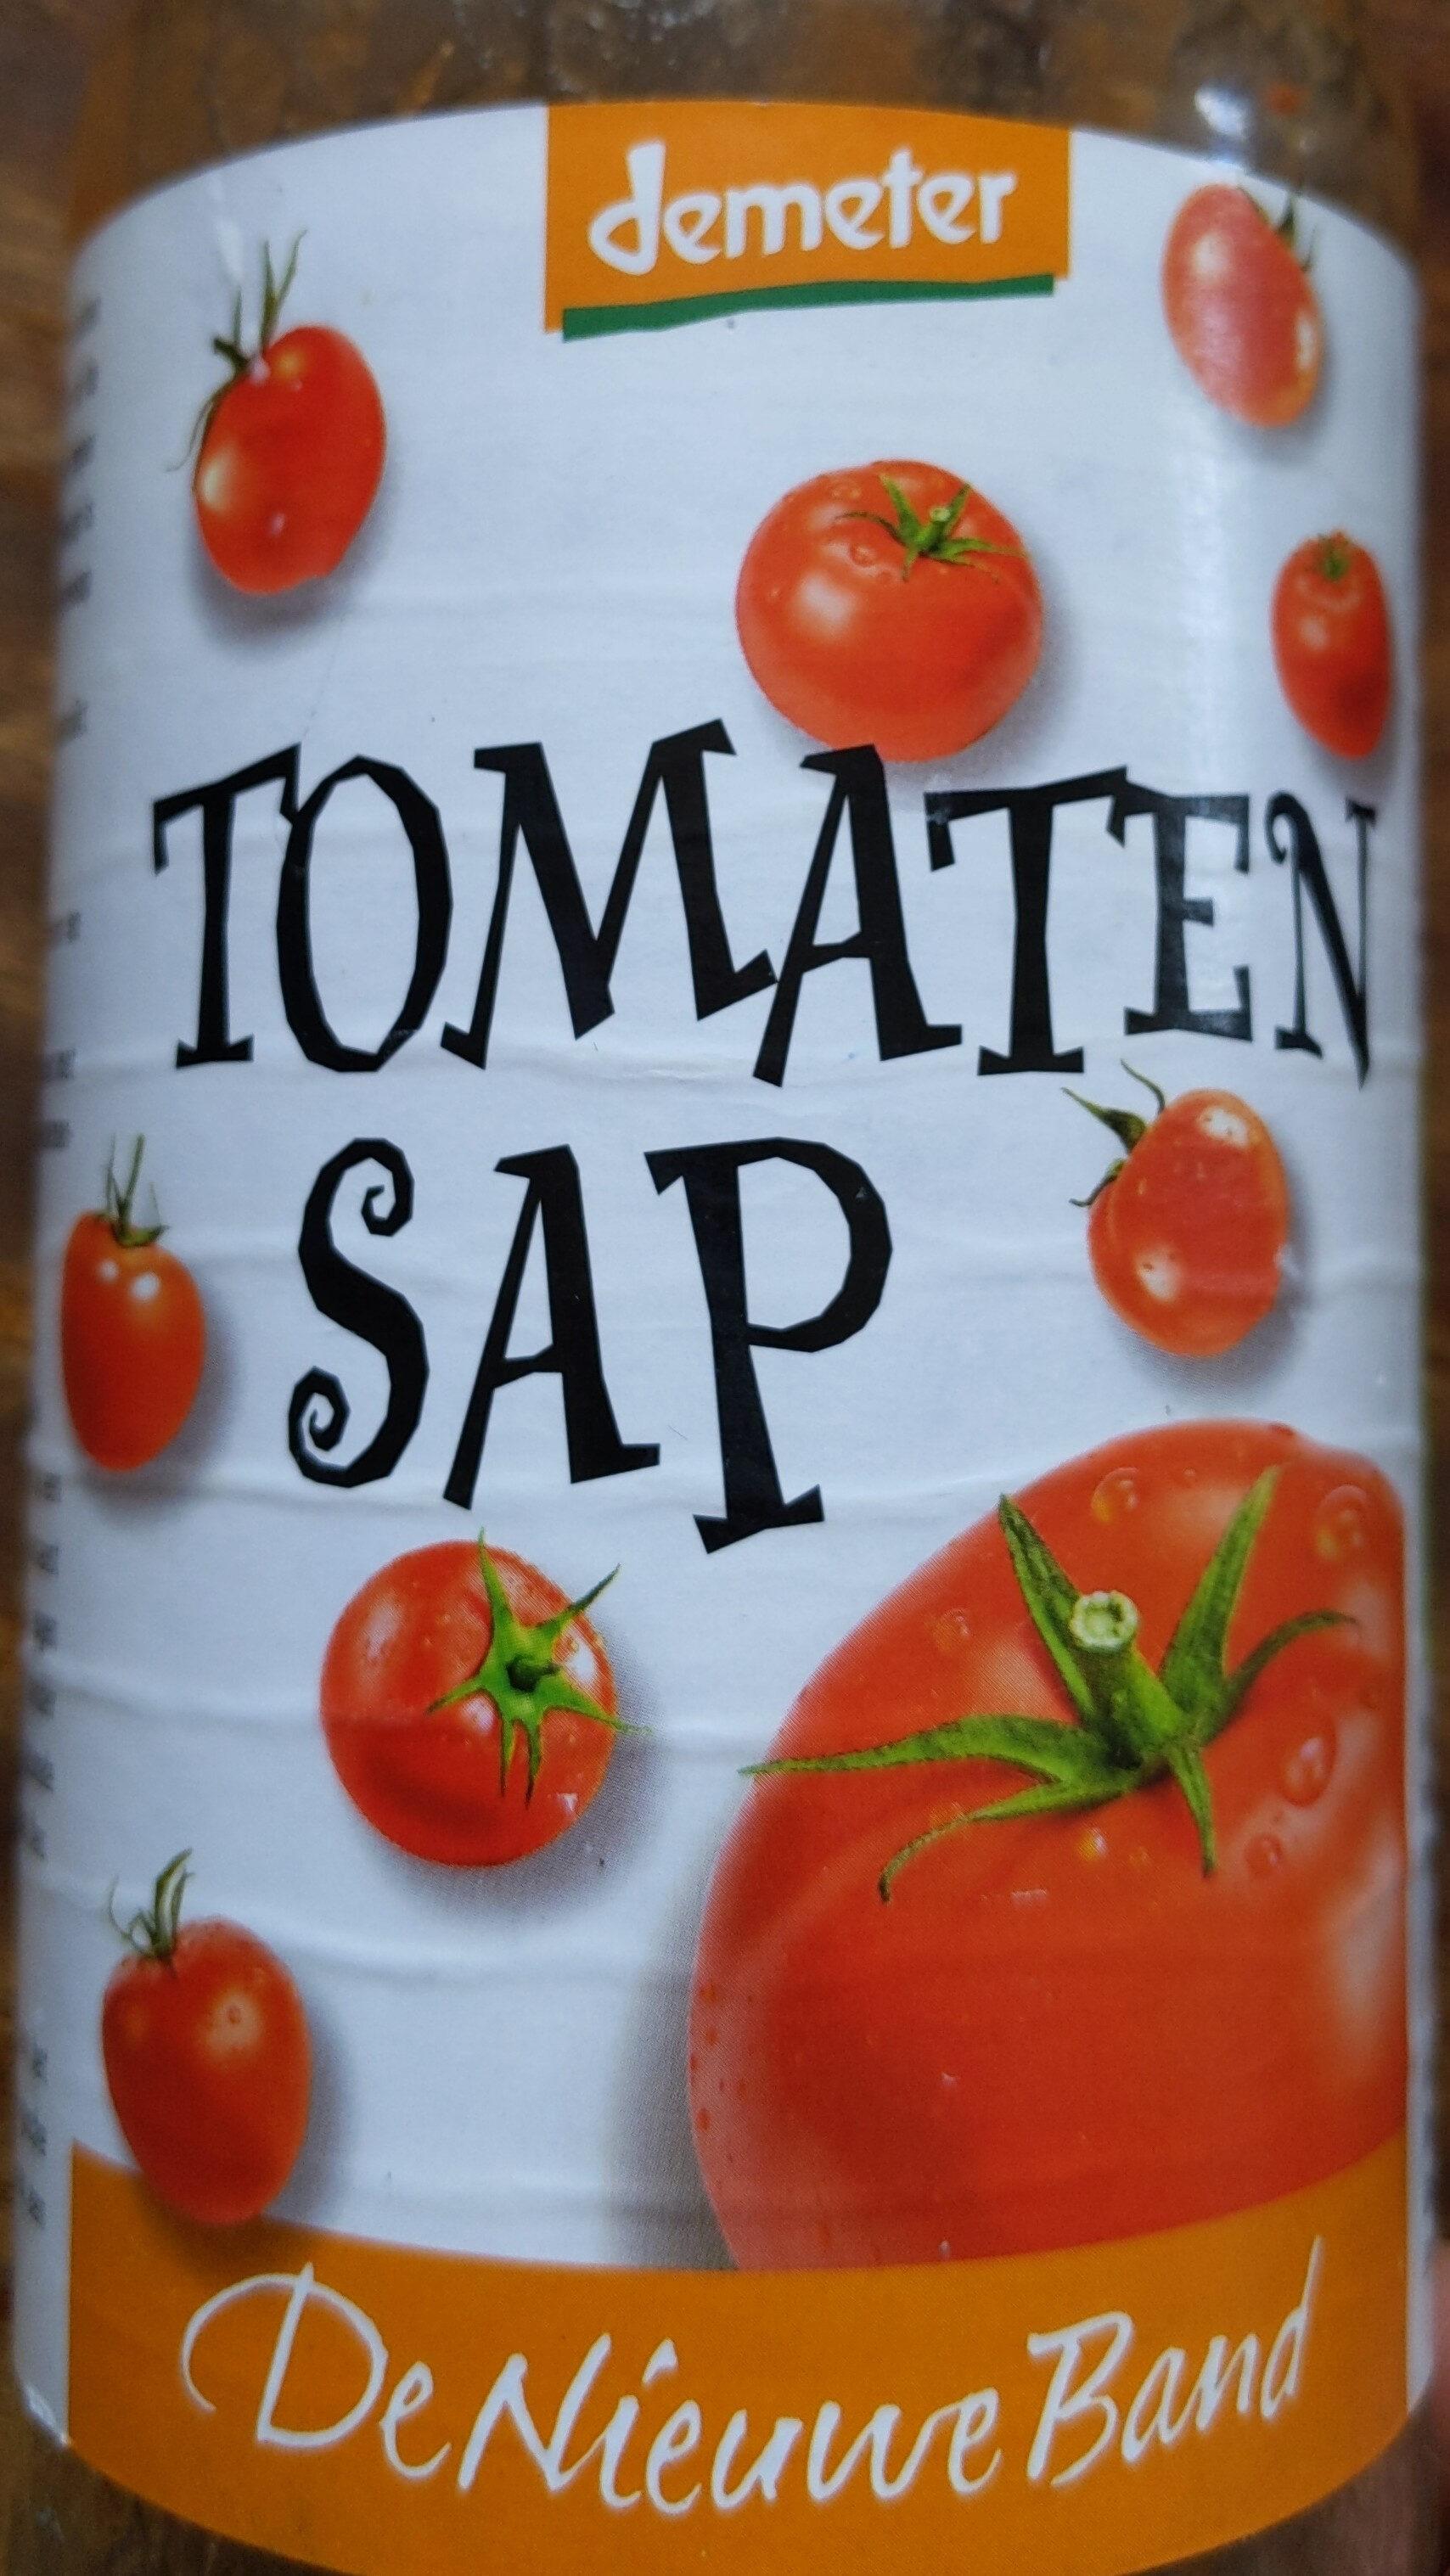 tomatensap - Product - nl